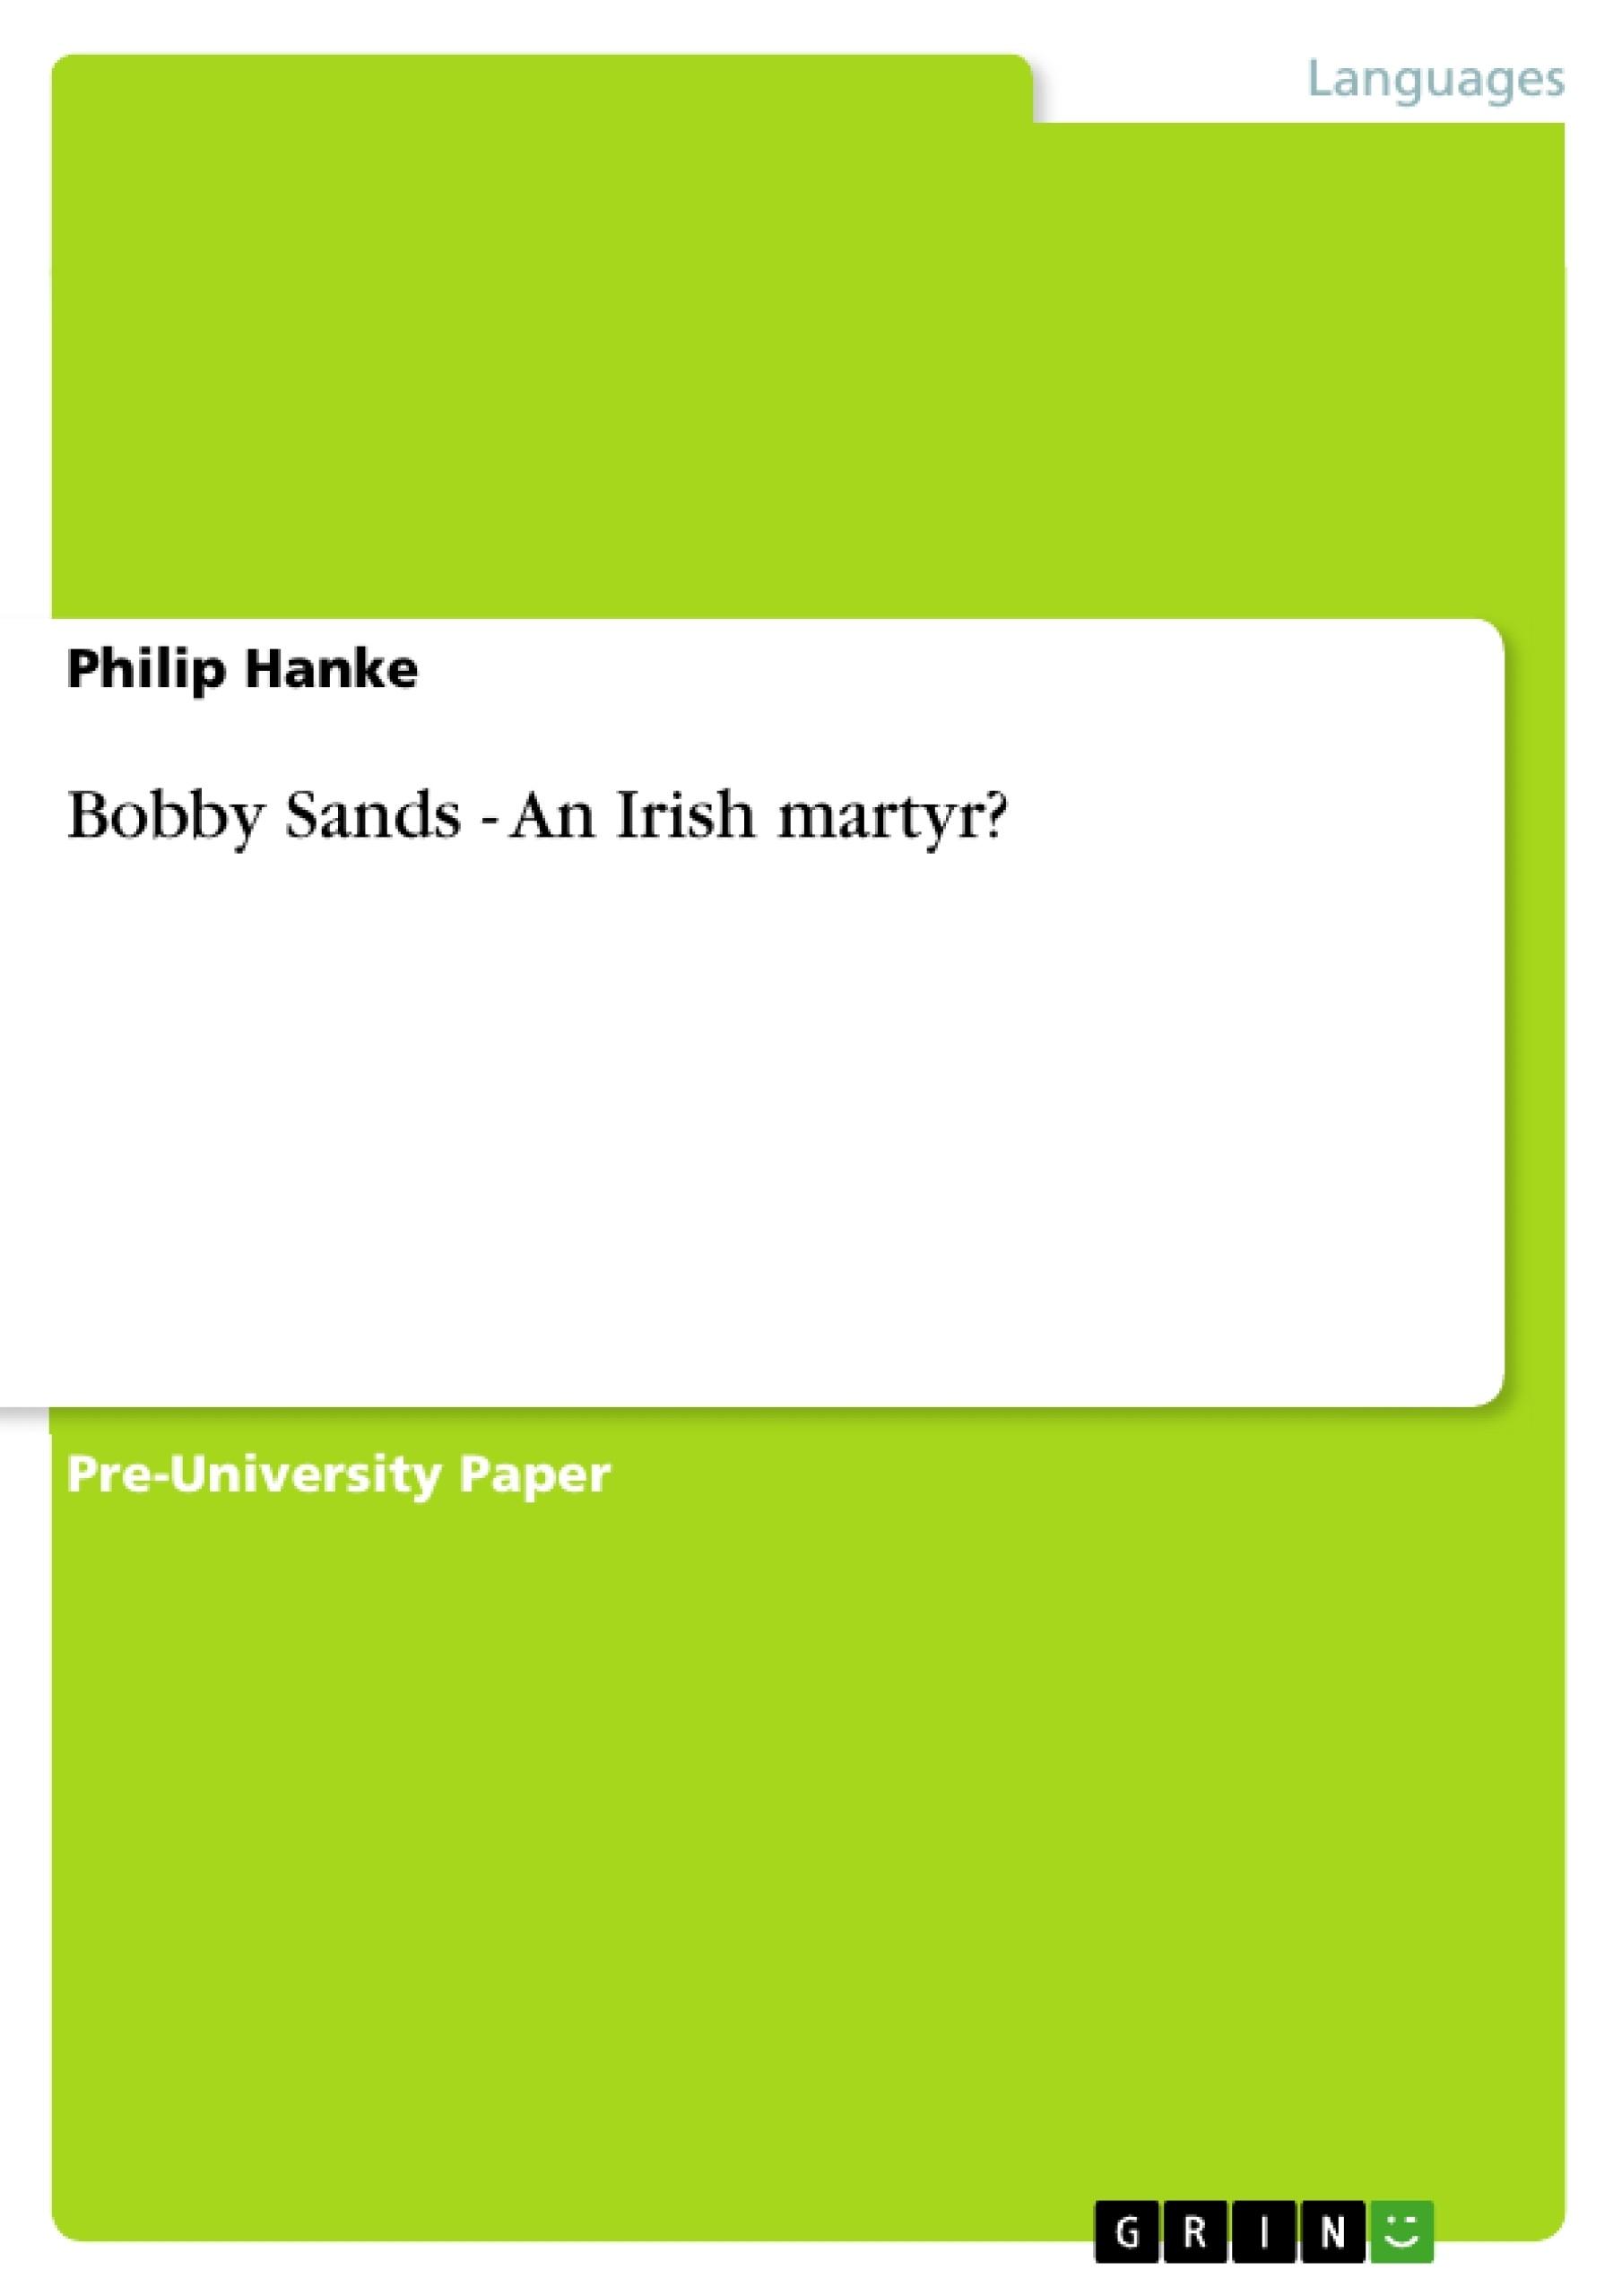 Title: Bobby Sands - An Irish martyr?